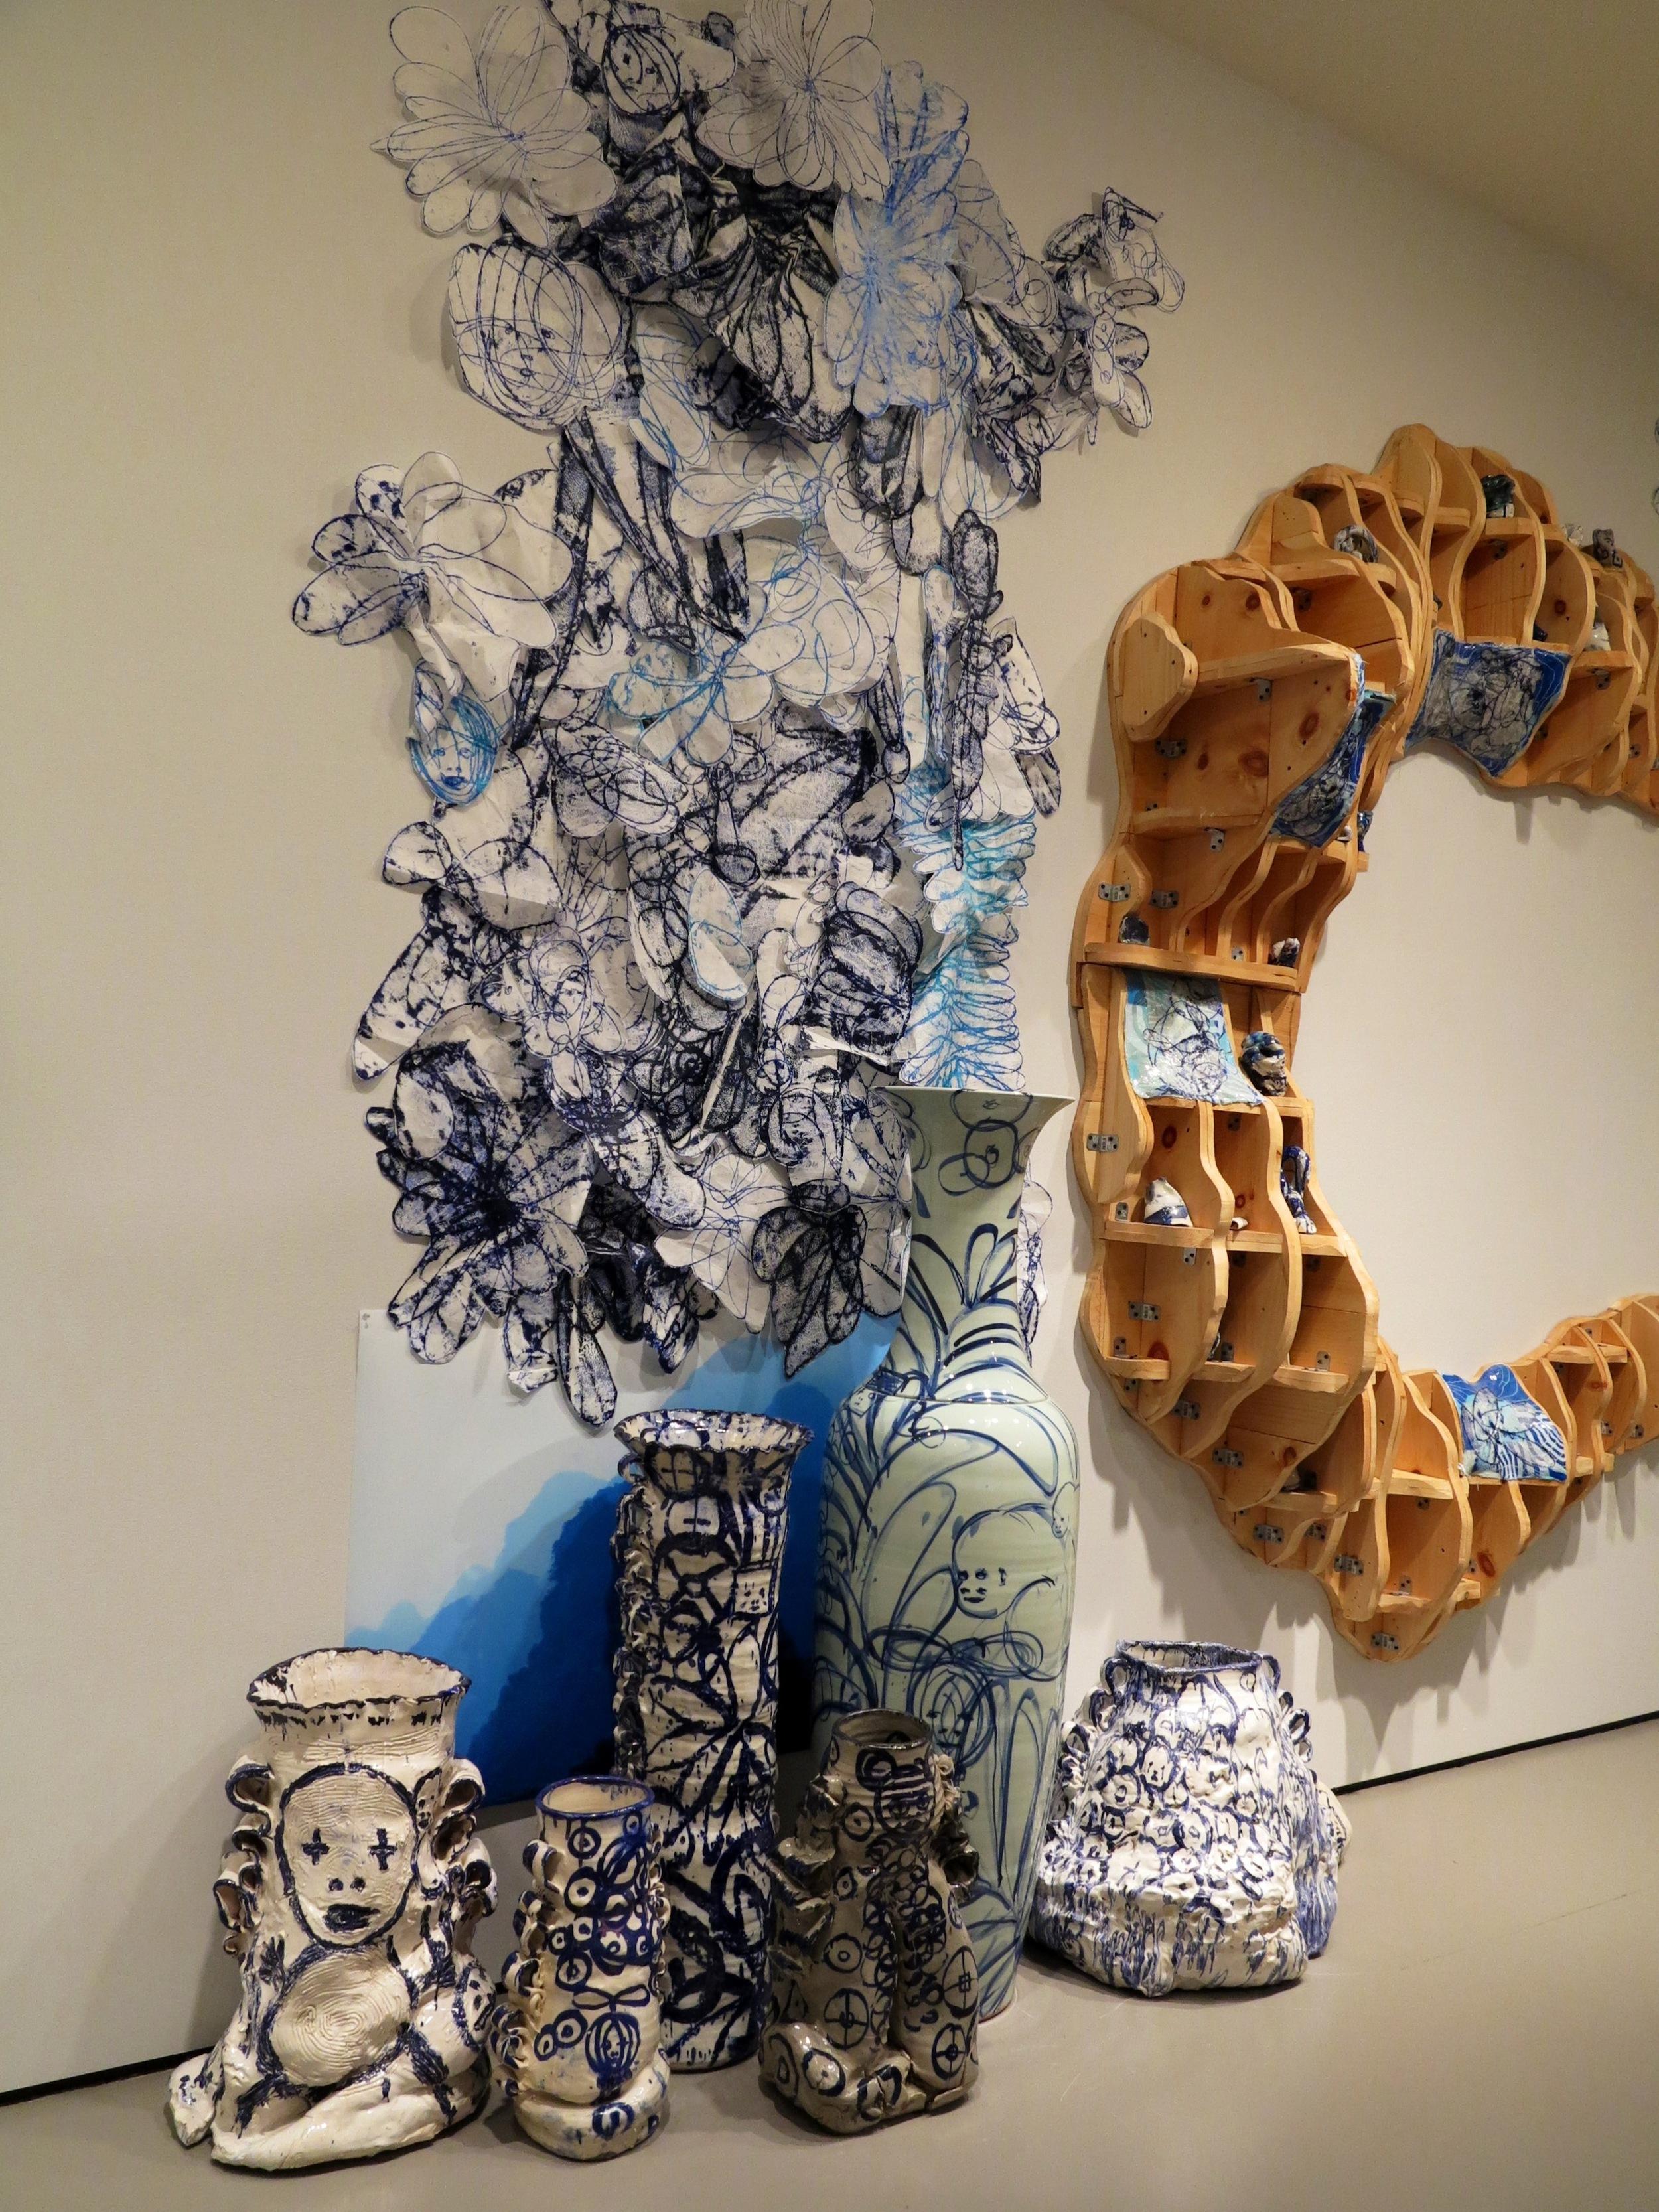 2.YuYu Blue, Boston Museum of Fine Arts Installation.JPG